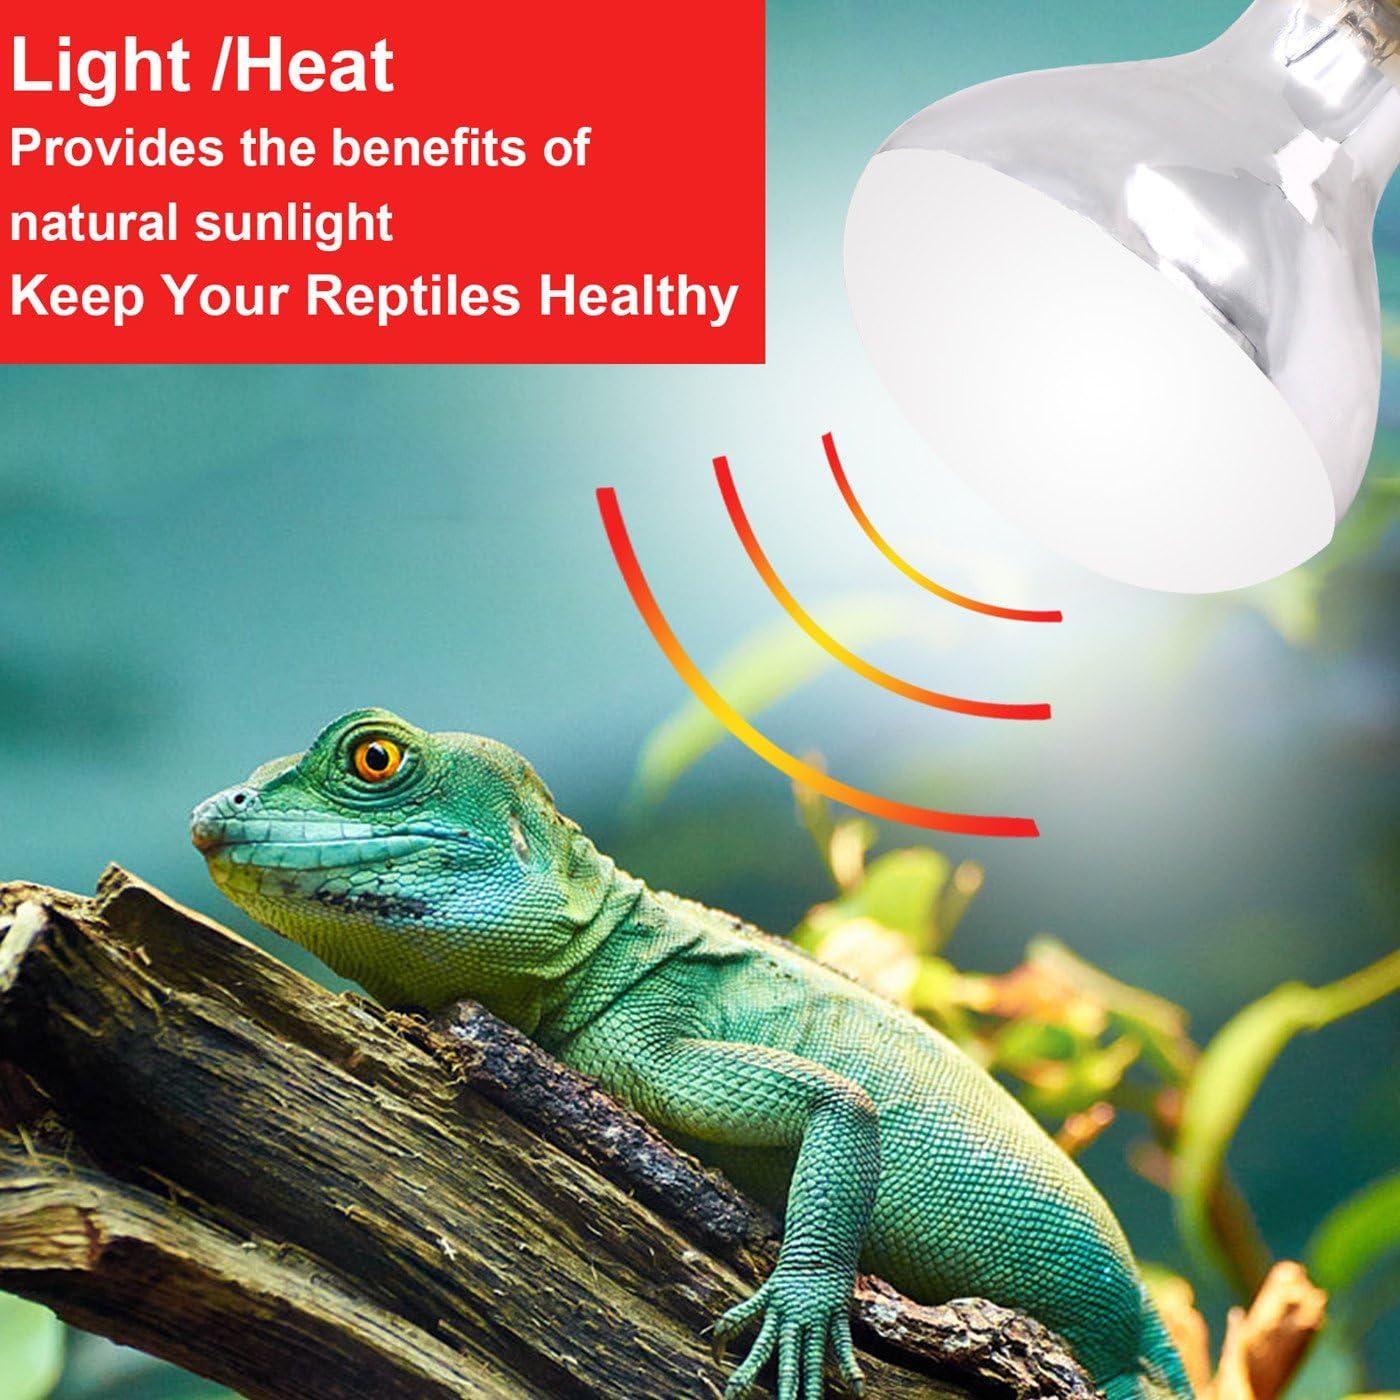 AIICIOO UVB UVA Bombilla Calor de Reptiles y Anfibios Promover la Síntesis D3 para Tortuga/Camaleón/Serpiente/Polluelo E27 220-240V 125W: Amazon.es: Productos para mascotas